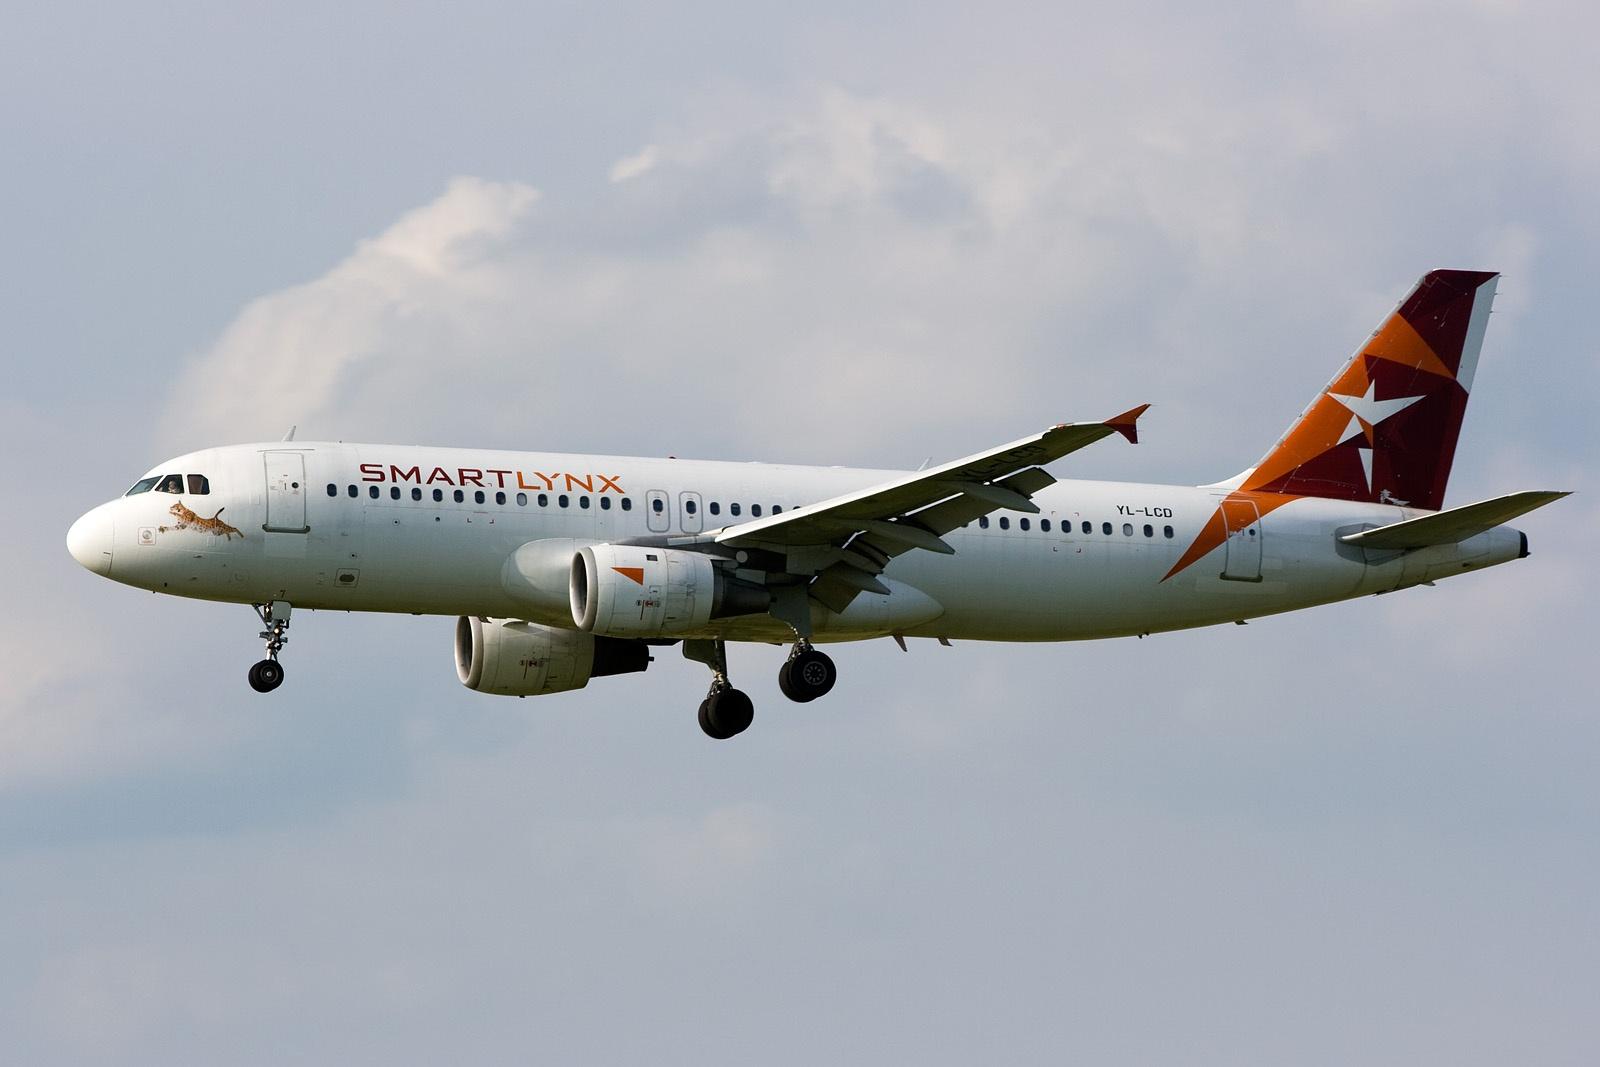 Airbus A320-200 fra SmartLynx Airlines. (Foto: Marek Vanzura)